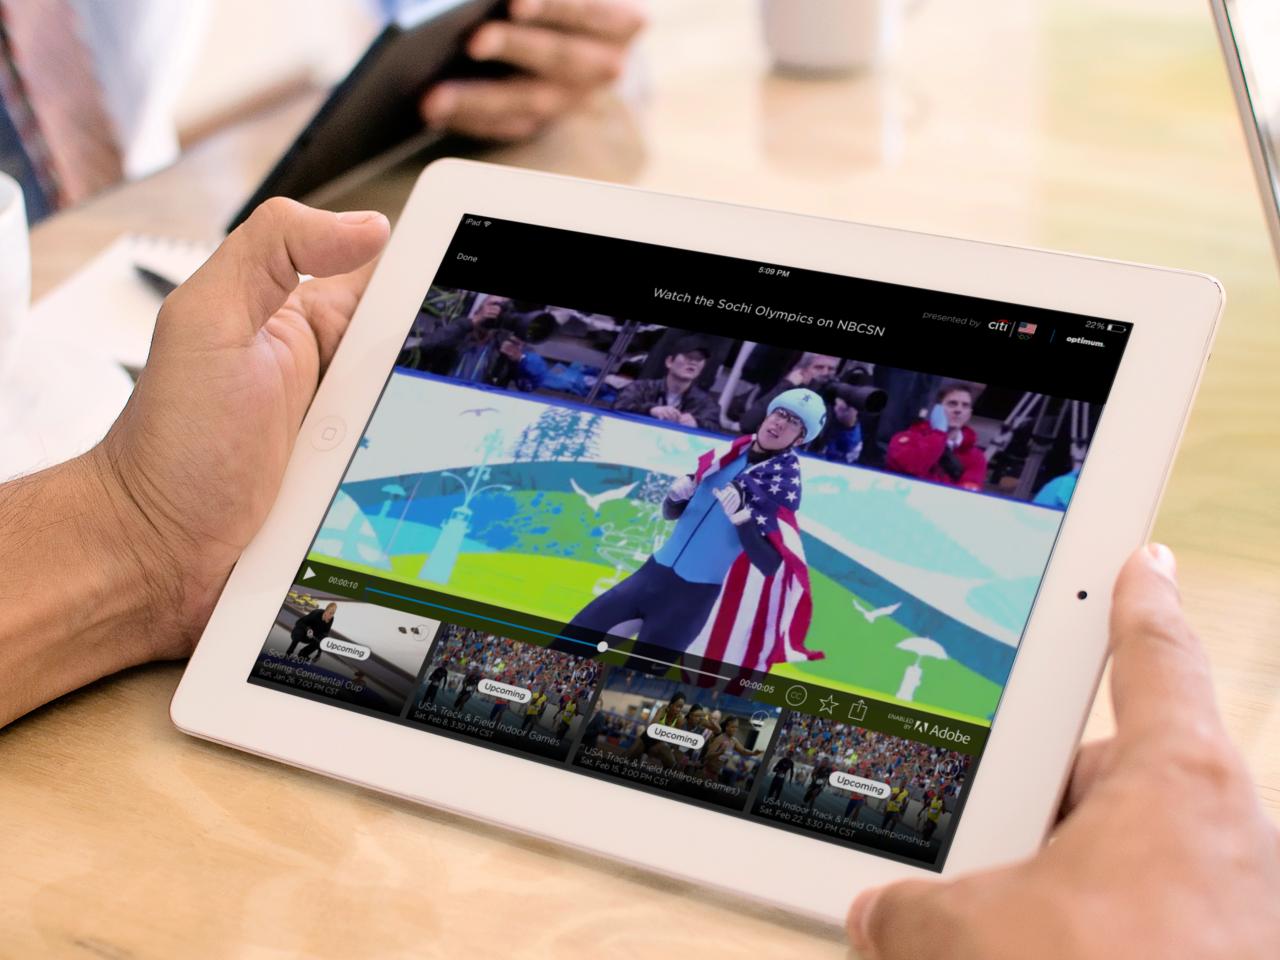 Adobe Sochi Olympics App Image v1